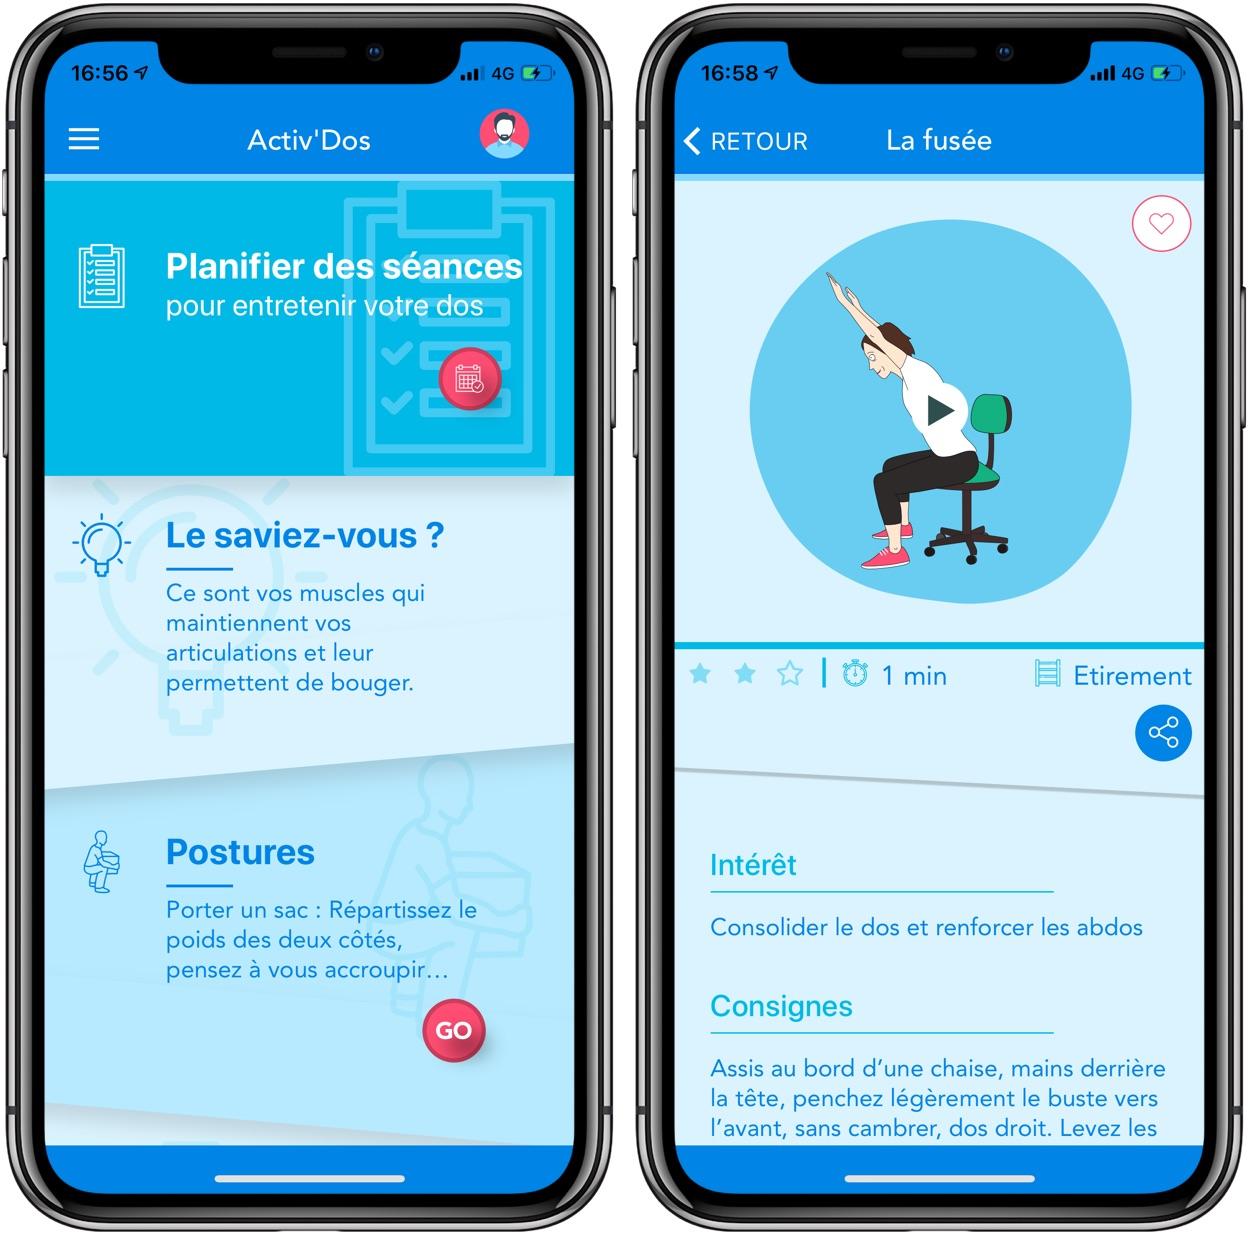 activ u0026 39 dos   une app iphone et ipad tr u00e8s compl u00e8te pour prendre soin de son dos